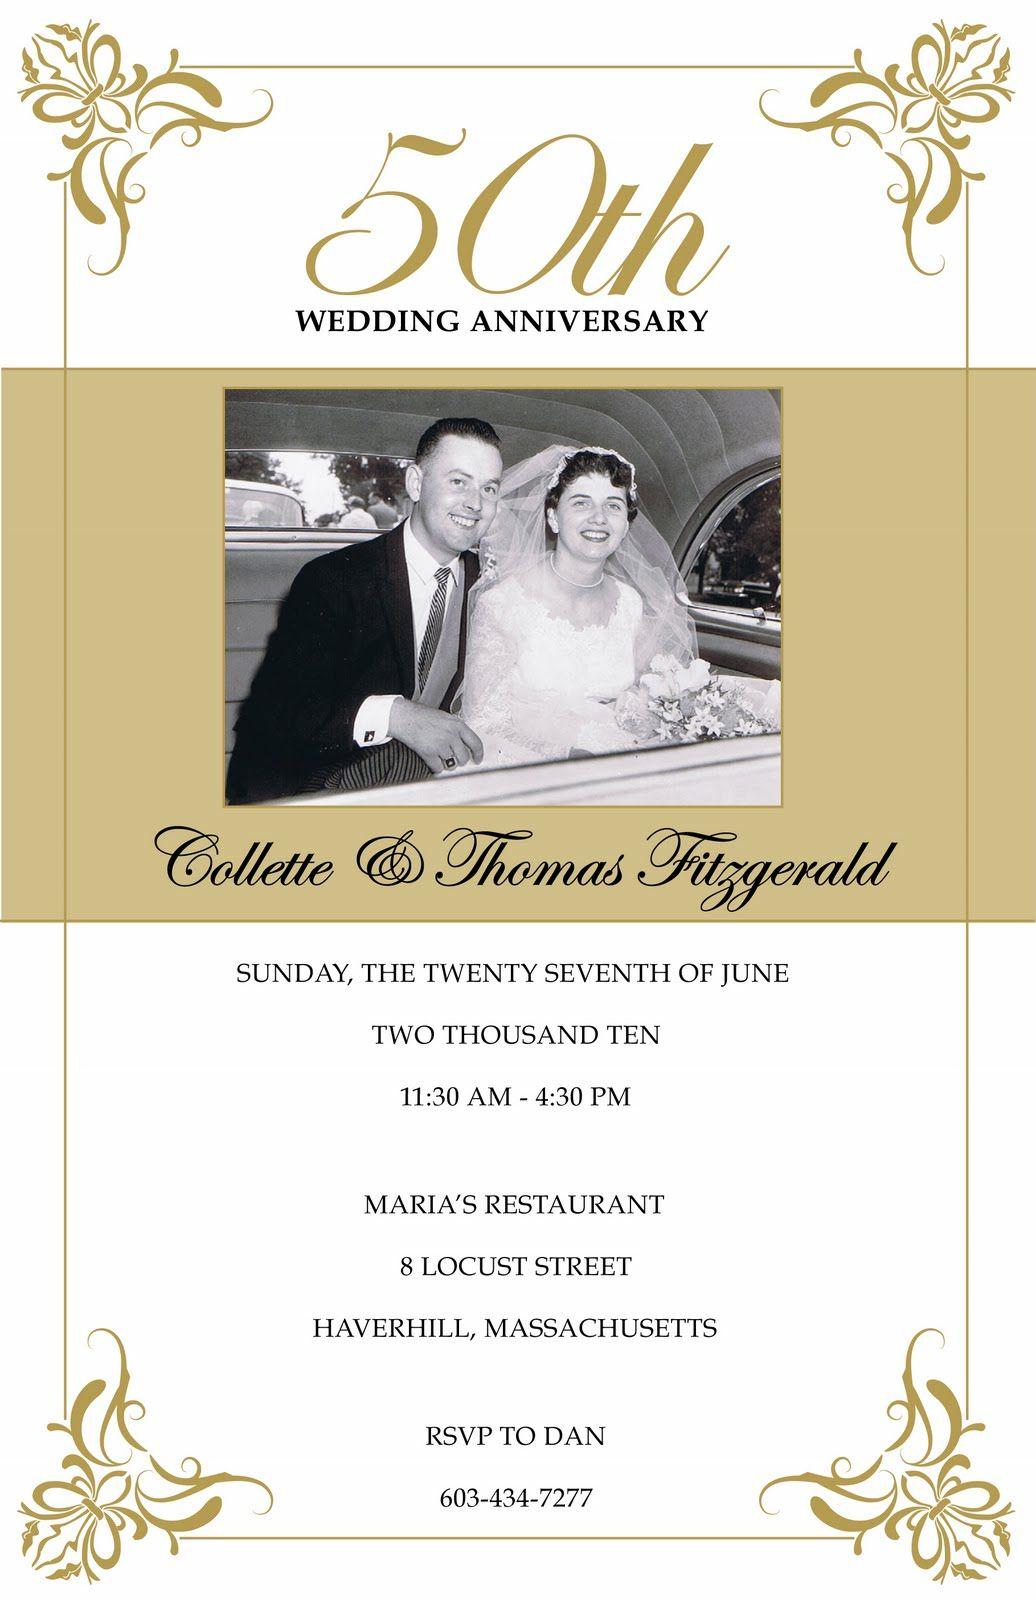 Free 50Th Wedding Anniversary Invitations Printable | 50Th - Free Printable 50Th Anniversary Cards